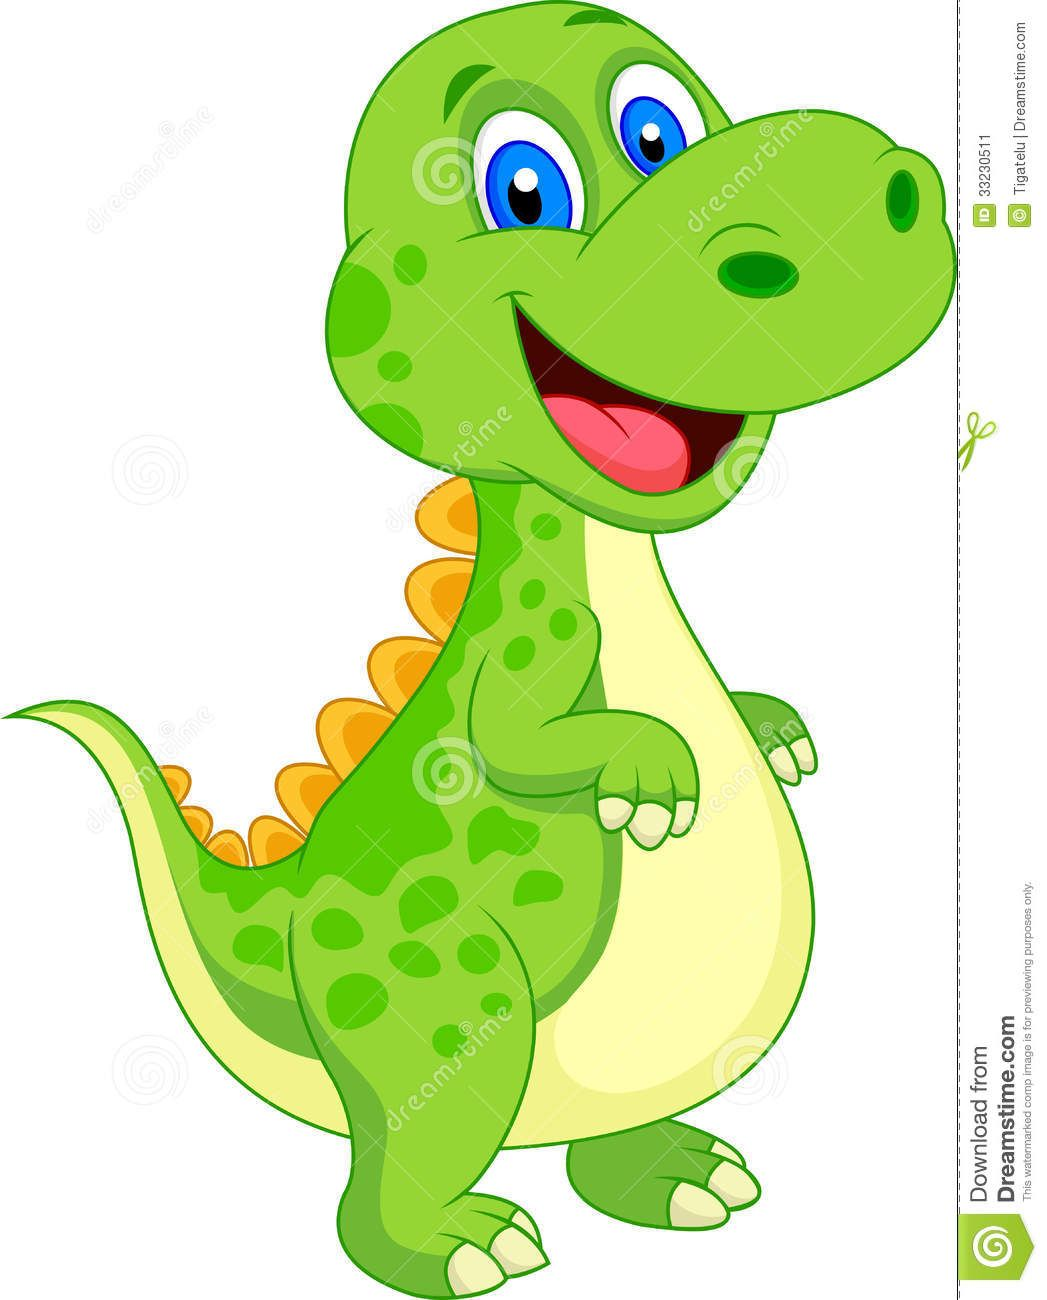 medium resolution of cute dinosaur cartoon stock image image 33230511